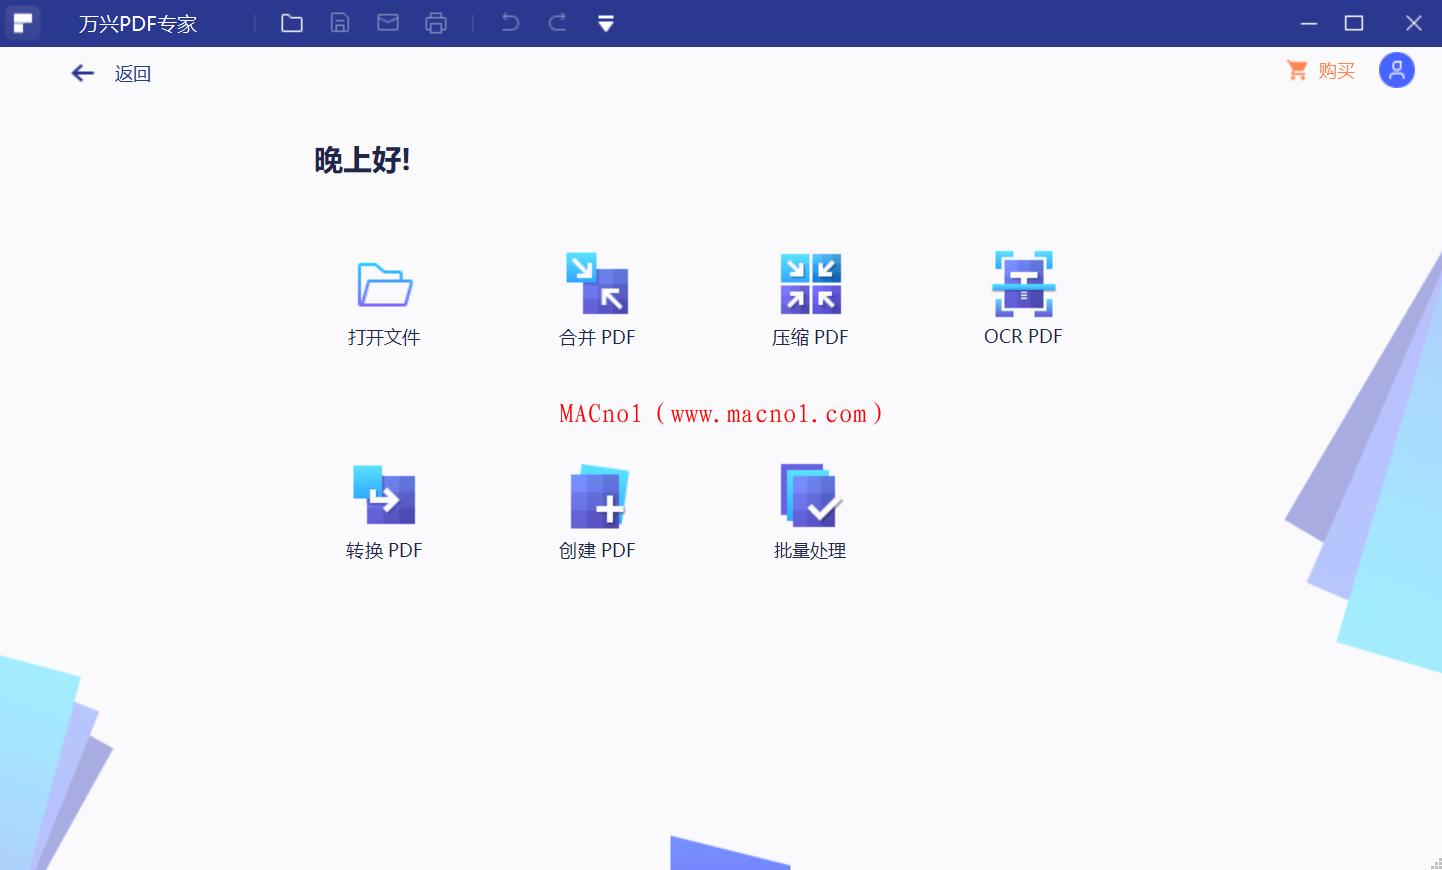 万兴PDF专家 PDFelement Pro for Mac v8.5.0 破解版 免激活码